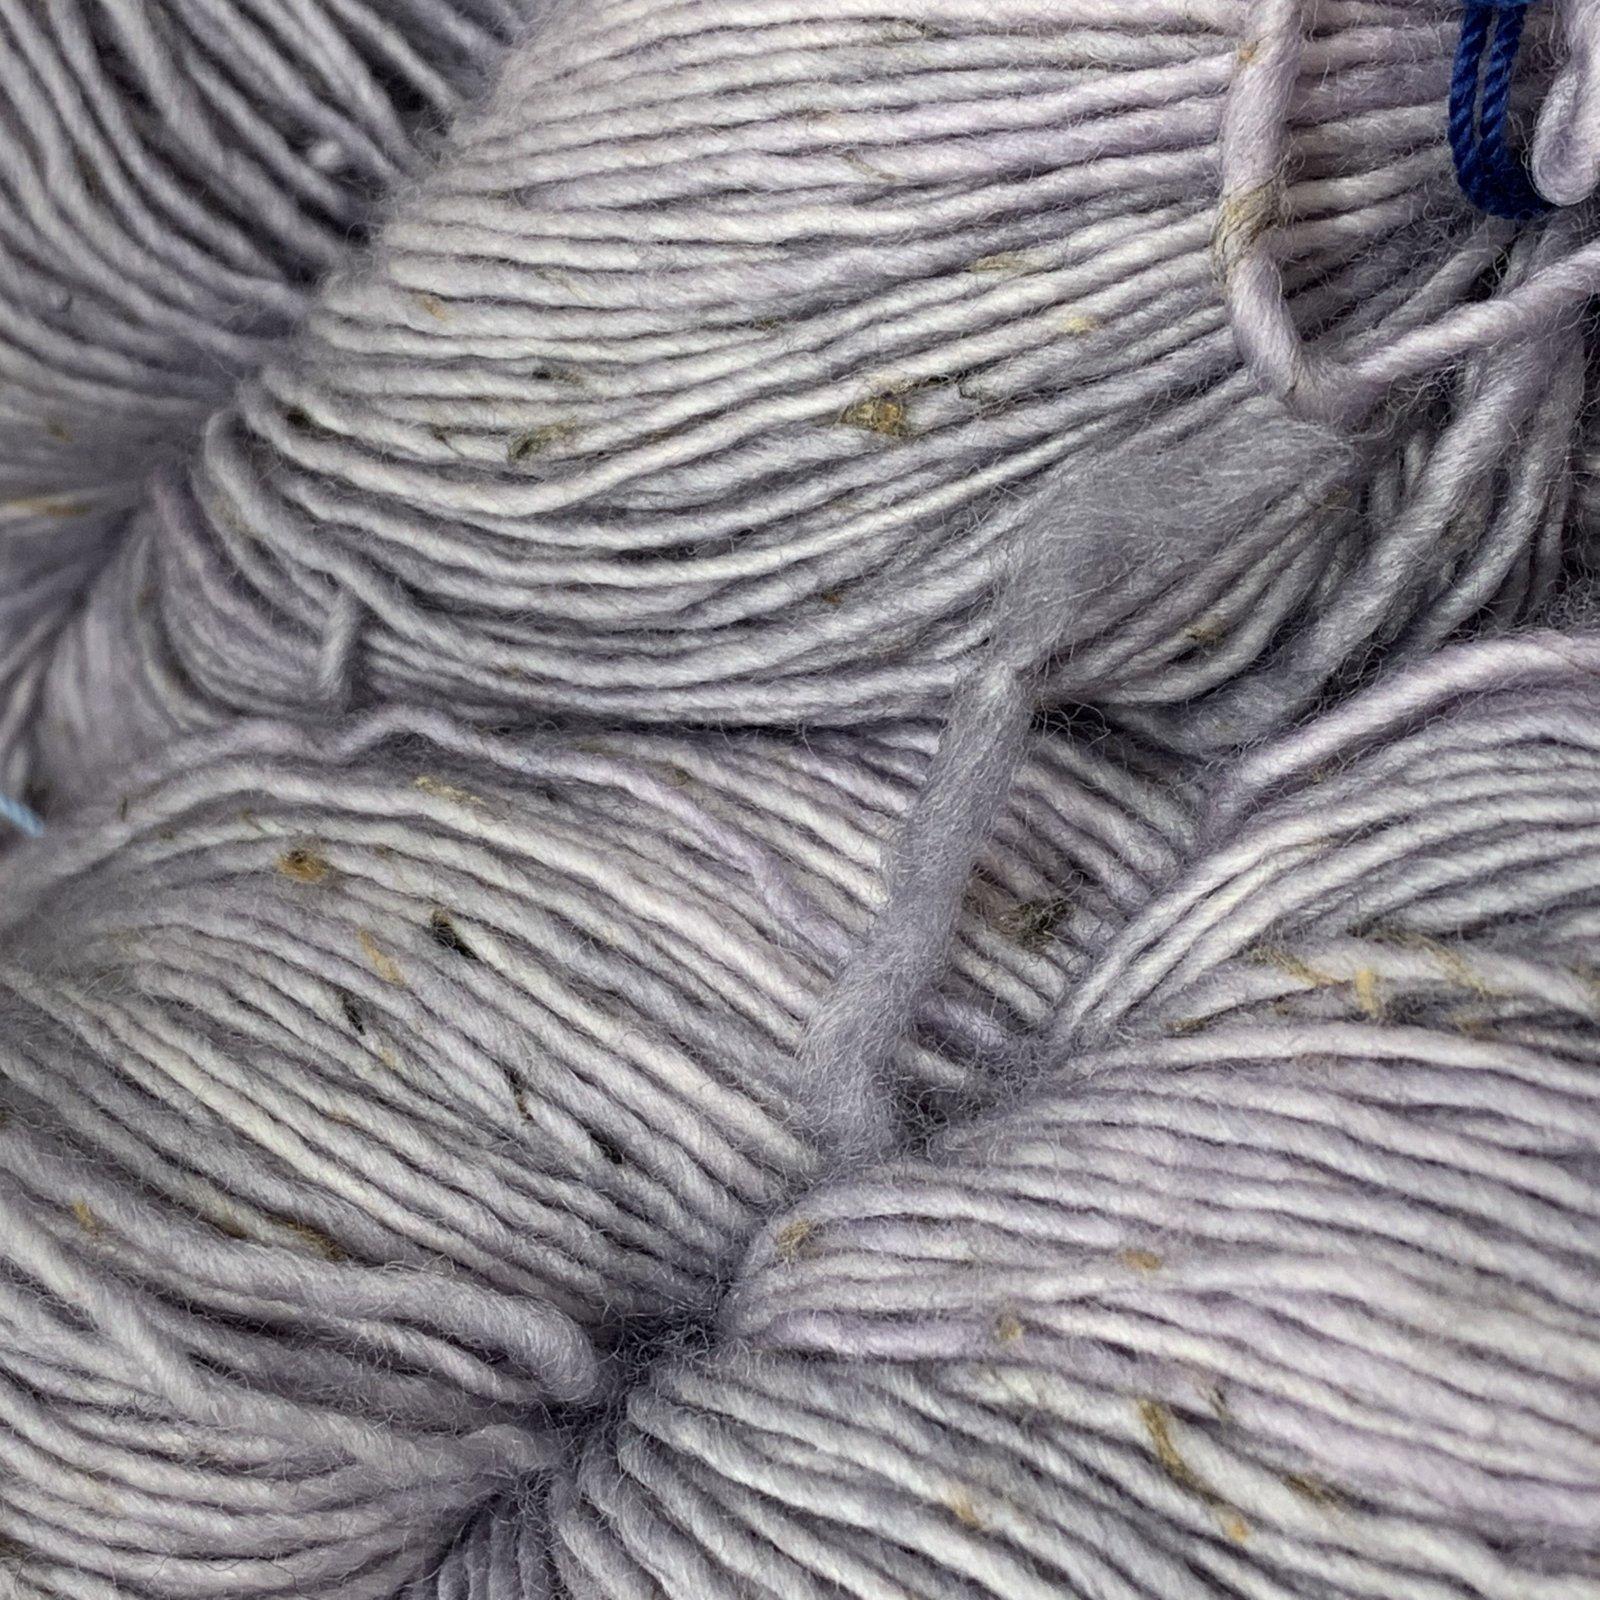 Madelinetosh Tweed - Moonstone